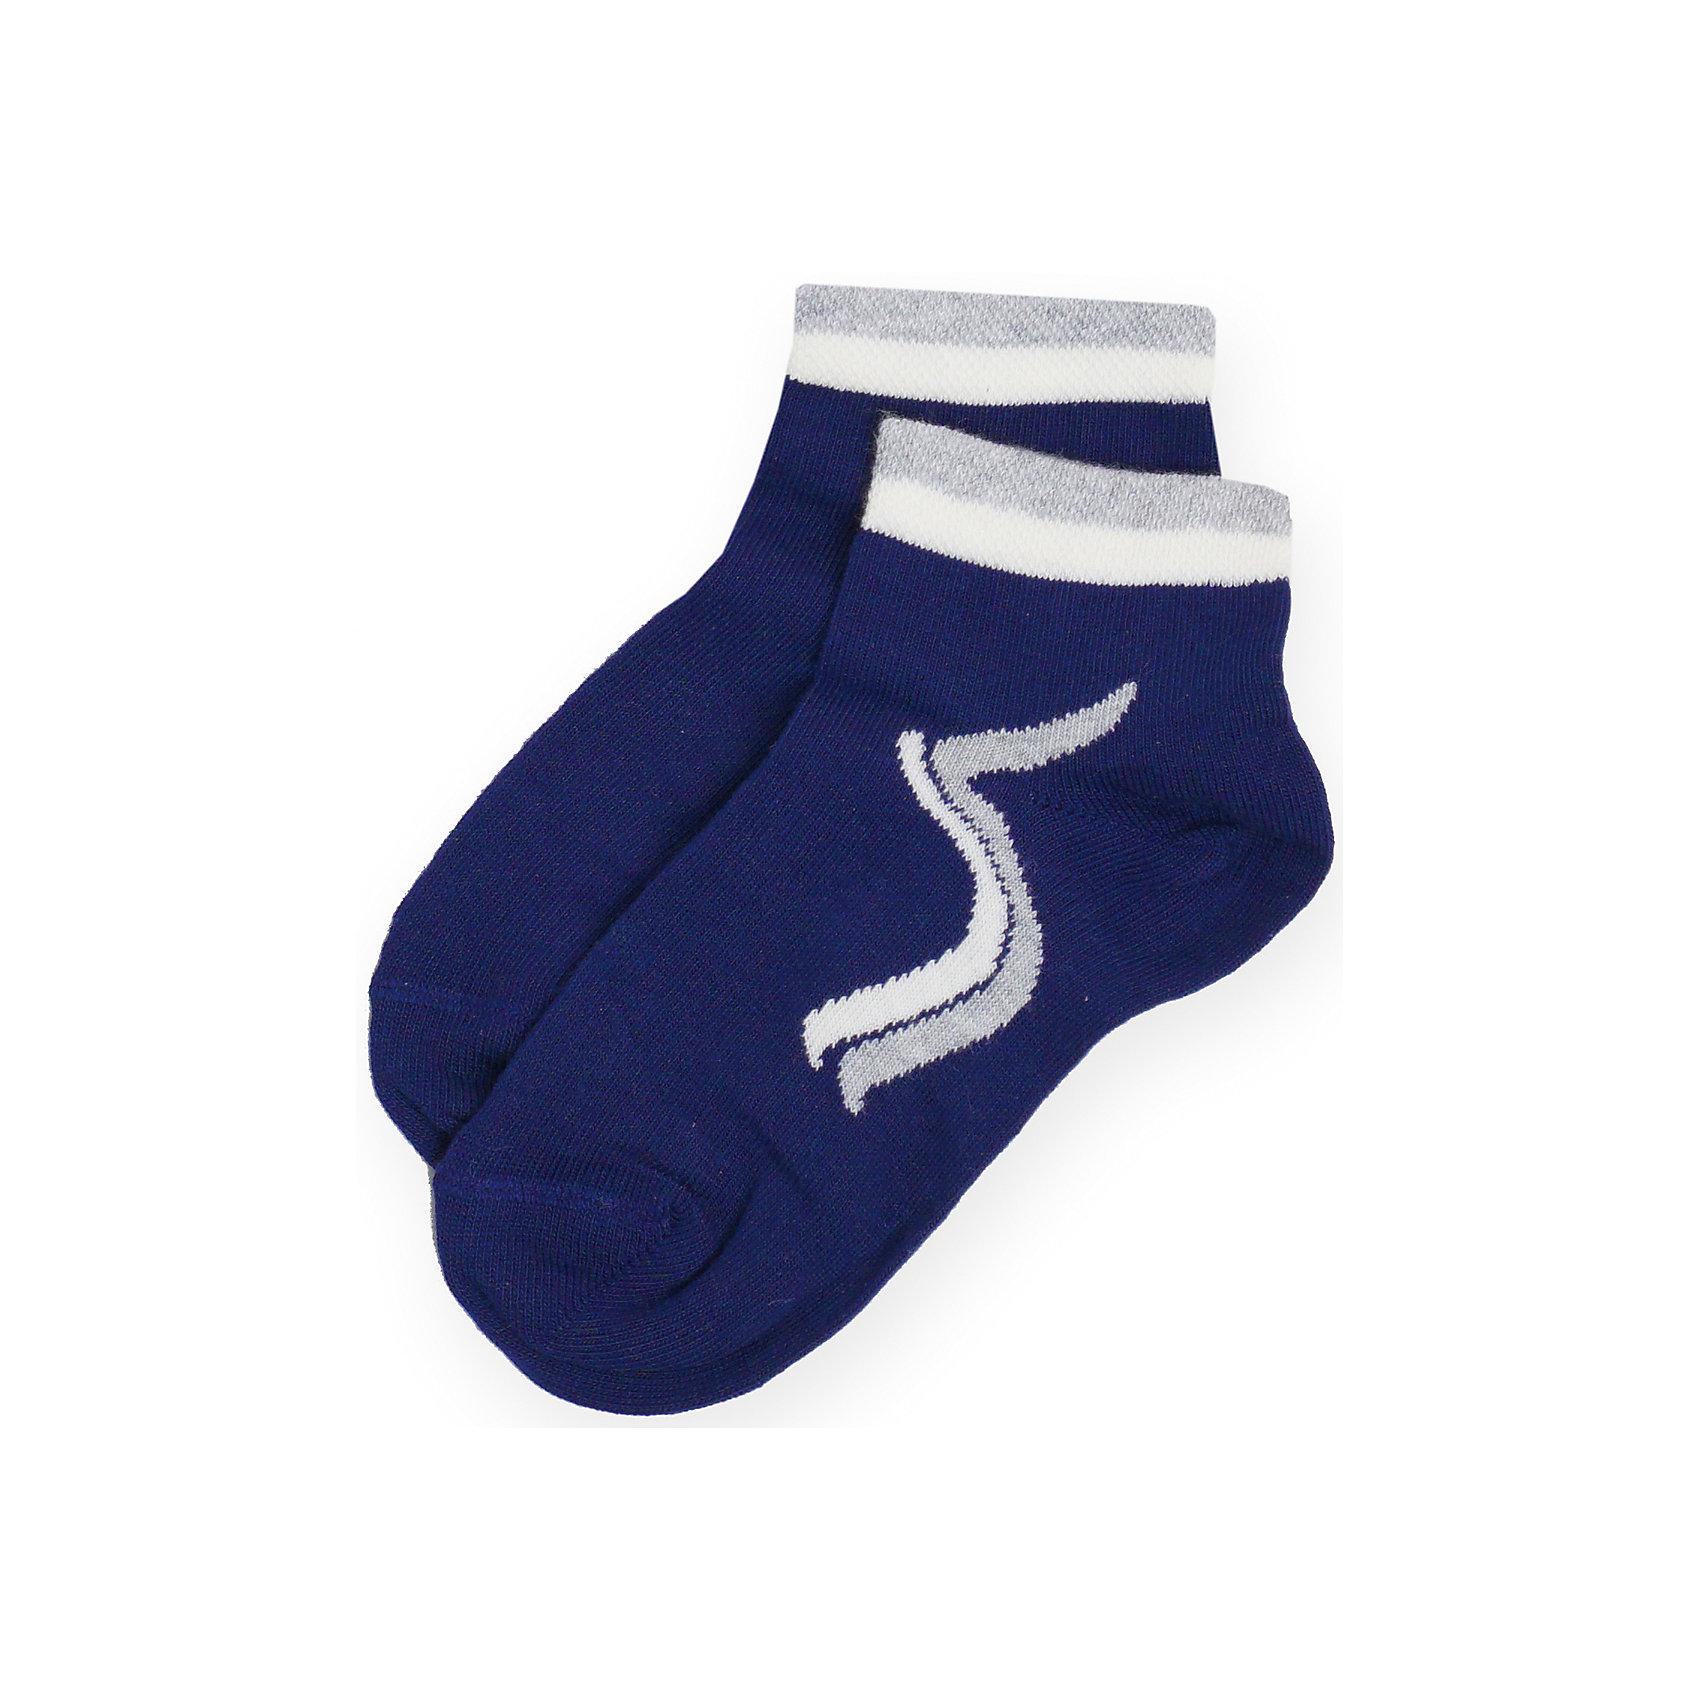 Носки, 2 шт. для мальчика Malerba от myToys